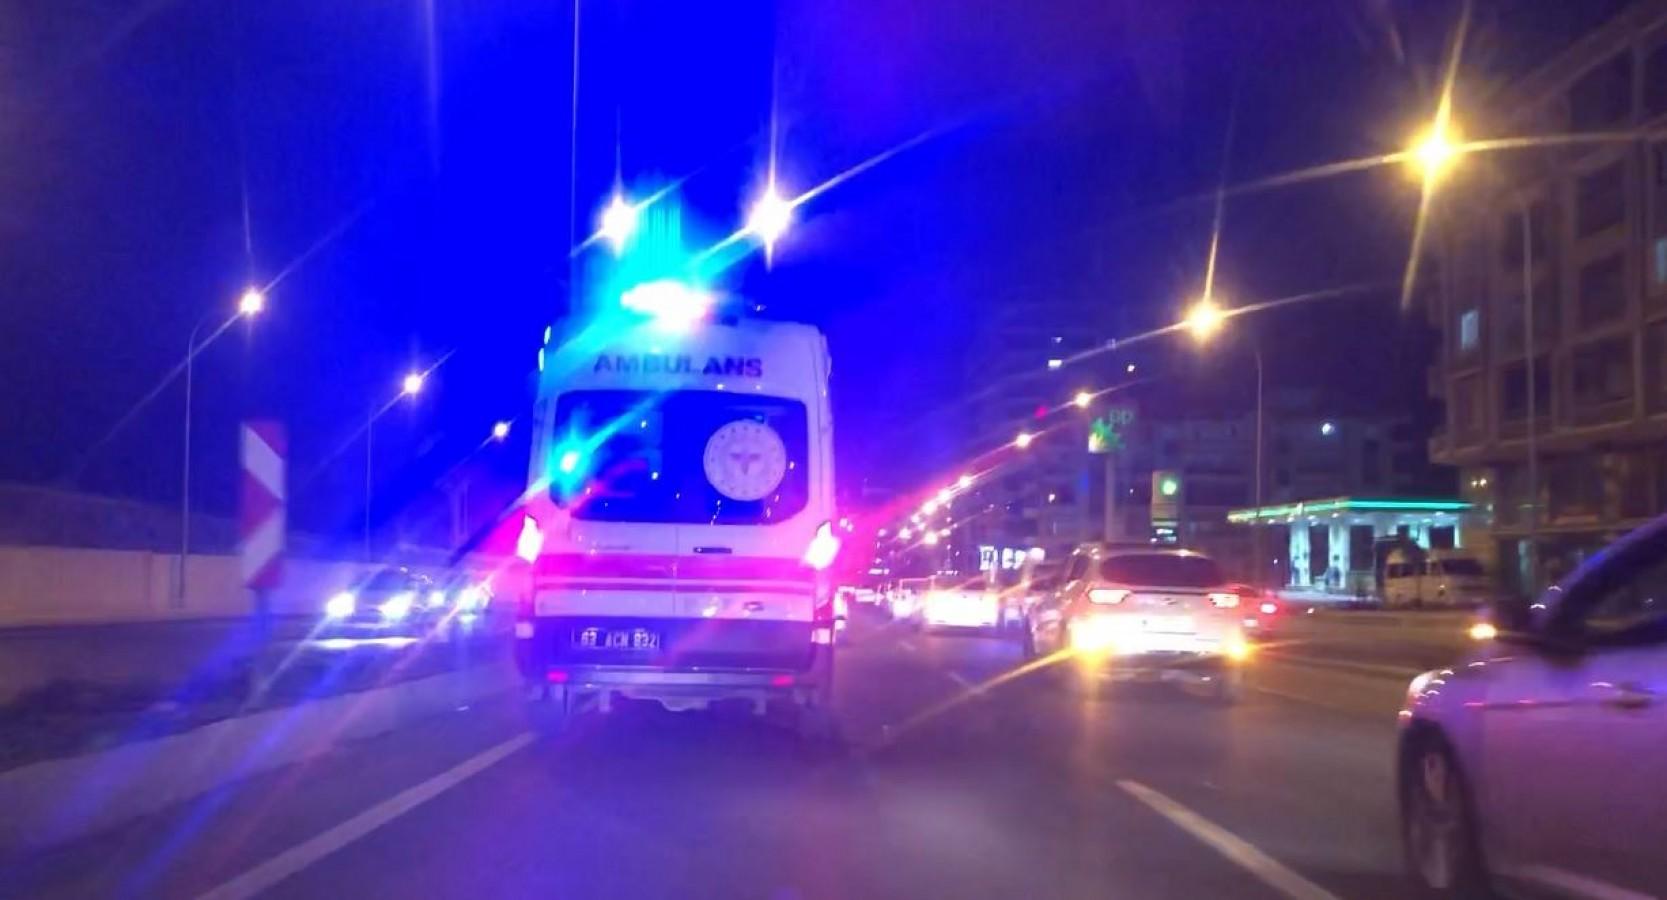 Urfa'da düğün konvoyu ambulansa geçit...